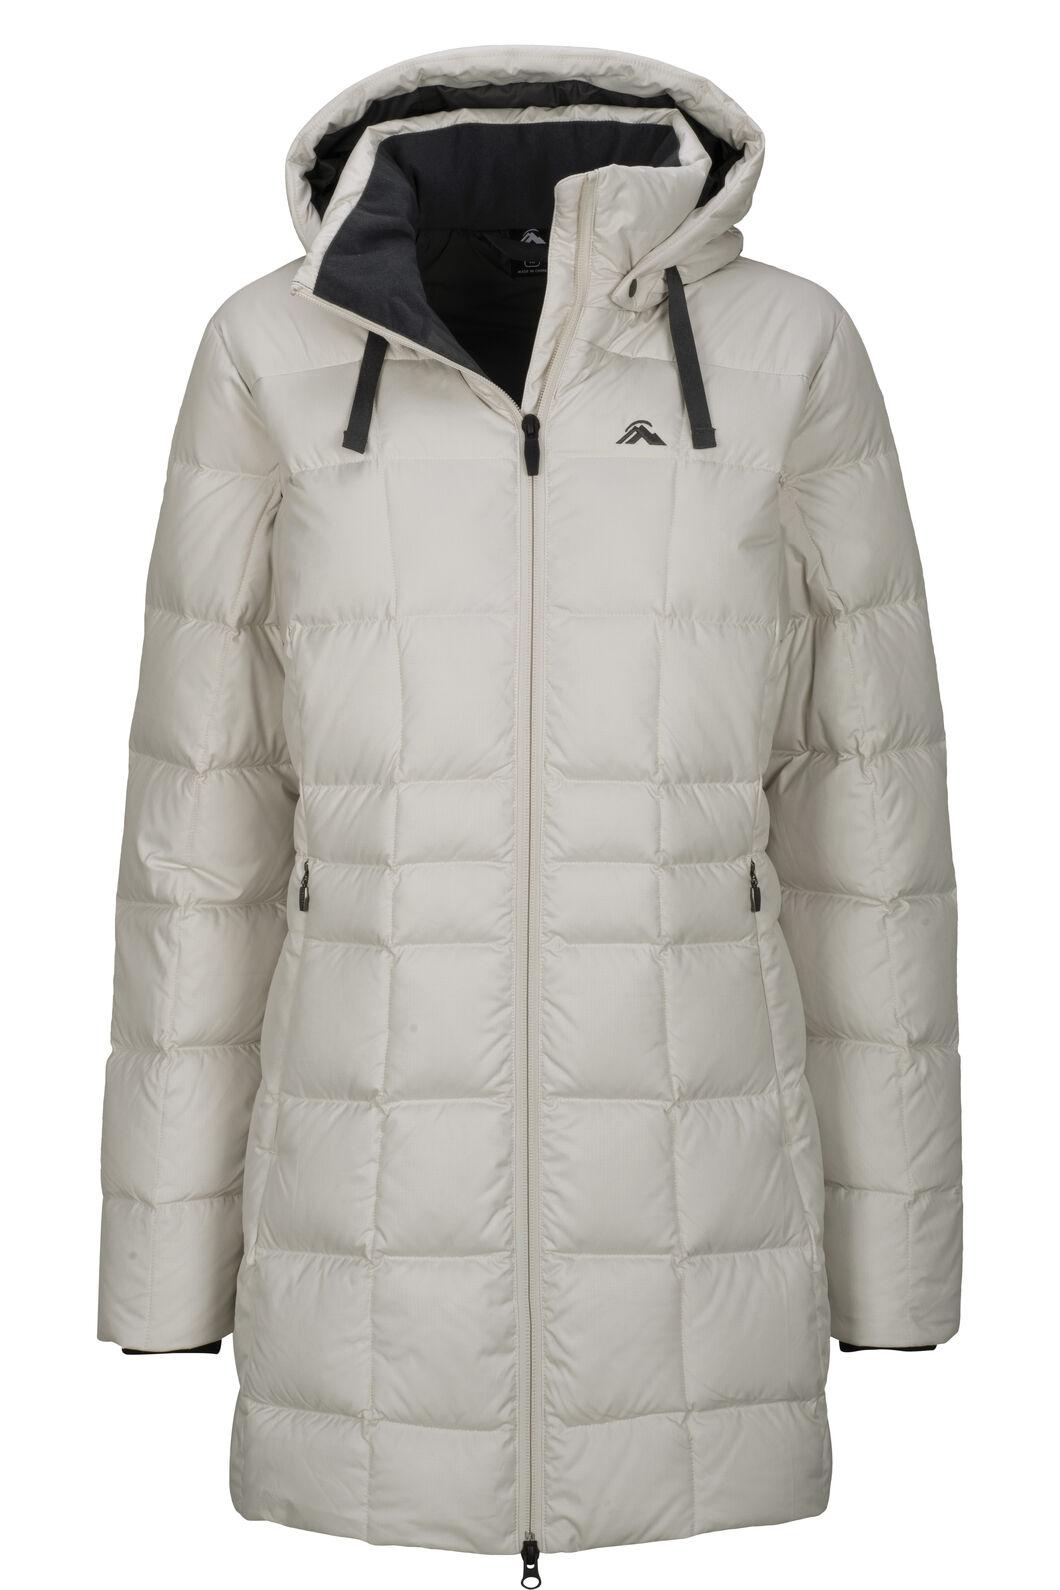 Macpac Women's Aurora Hooded Down Coat ♺, Moonbeam, hi-res